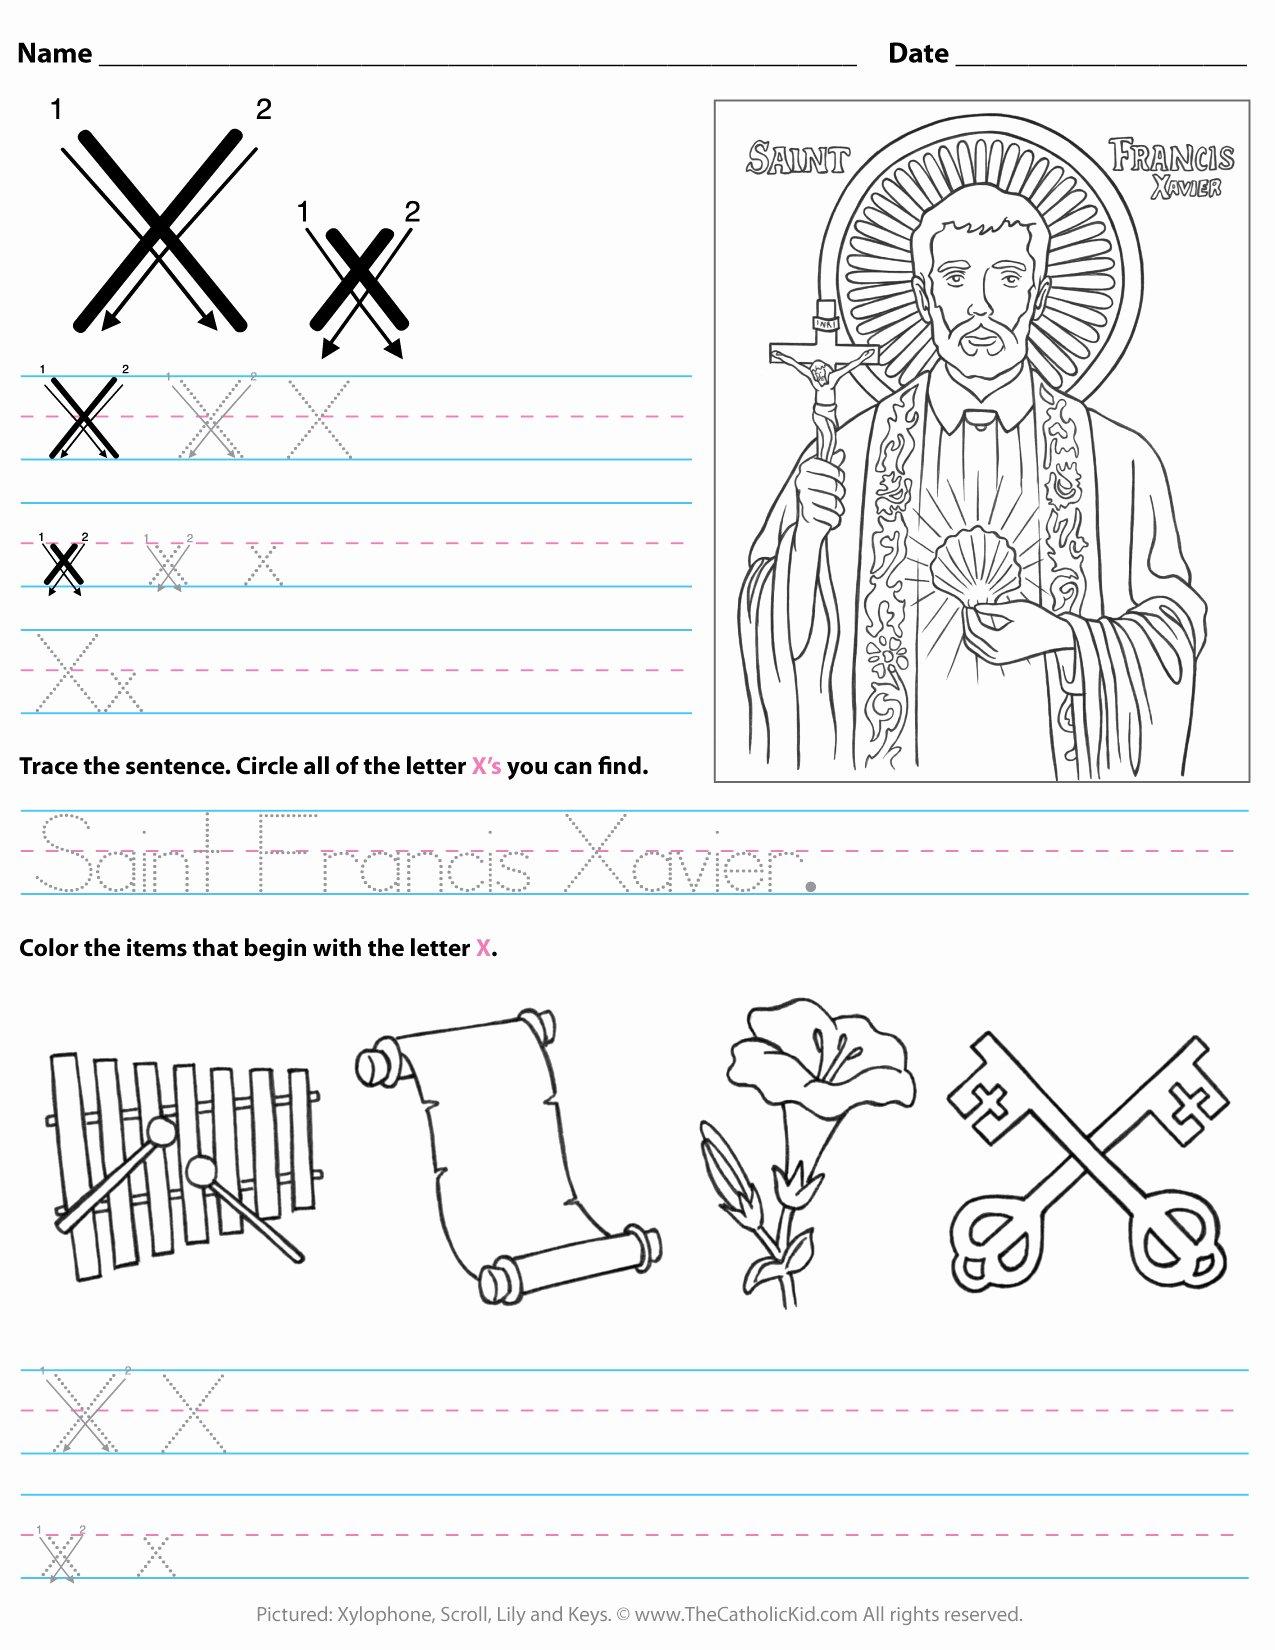 X Worksheets for Preschoolers Inspirational Catholic Alphabet Letter X Worksheet Preschool Kindergarten